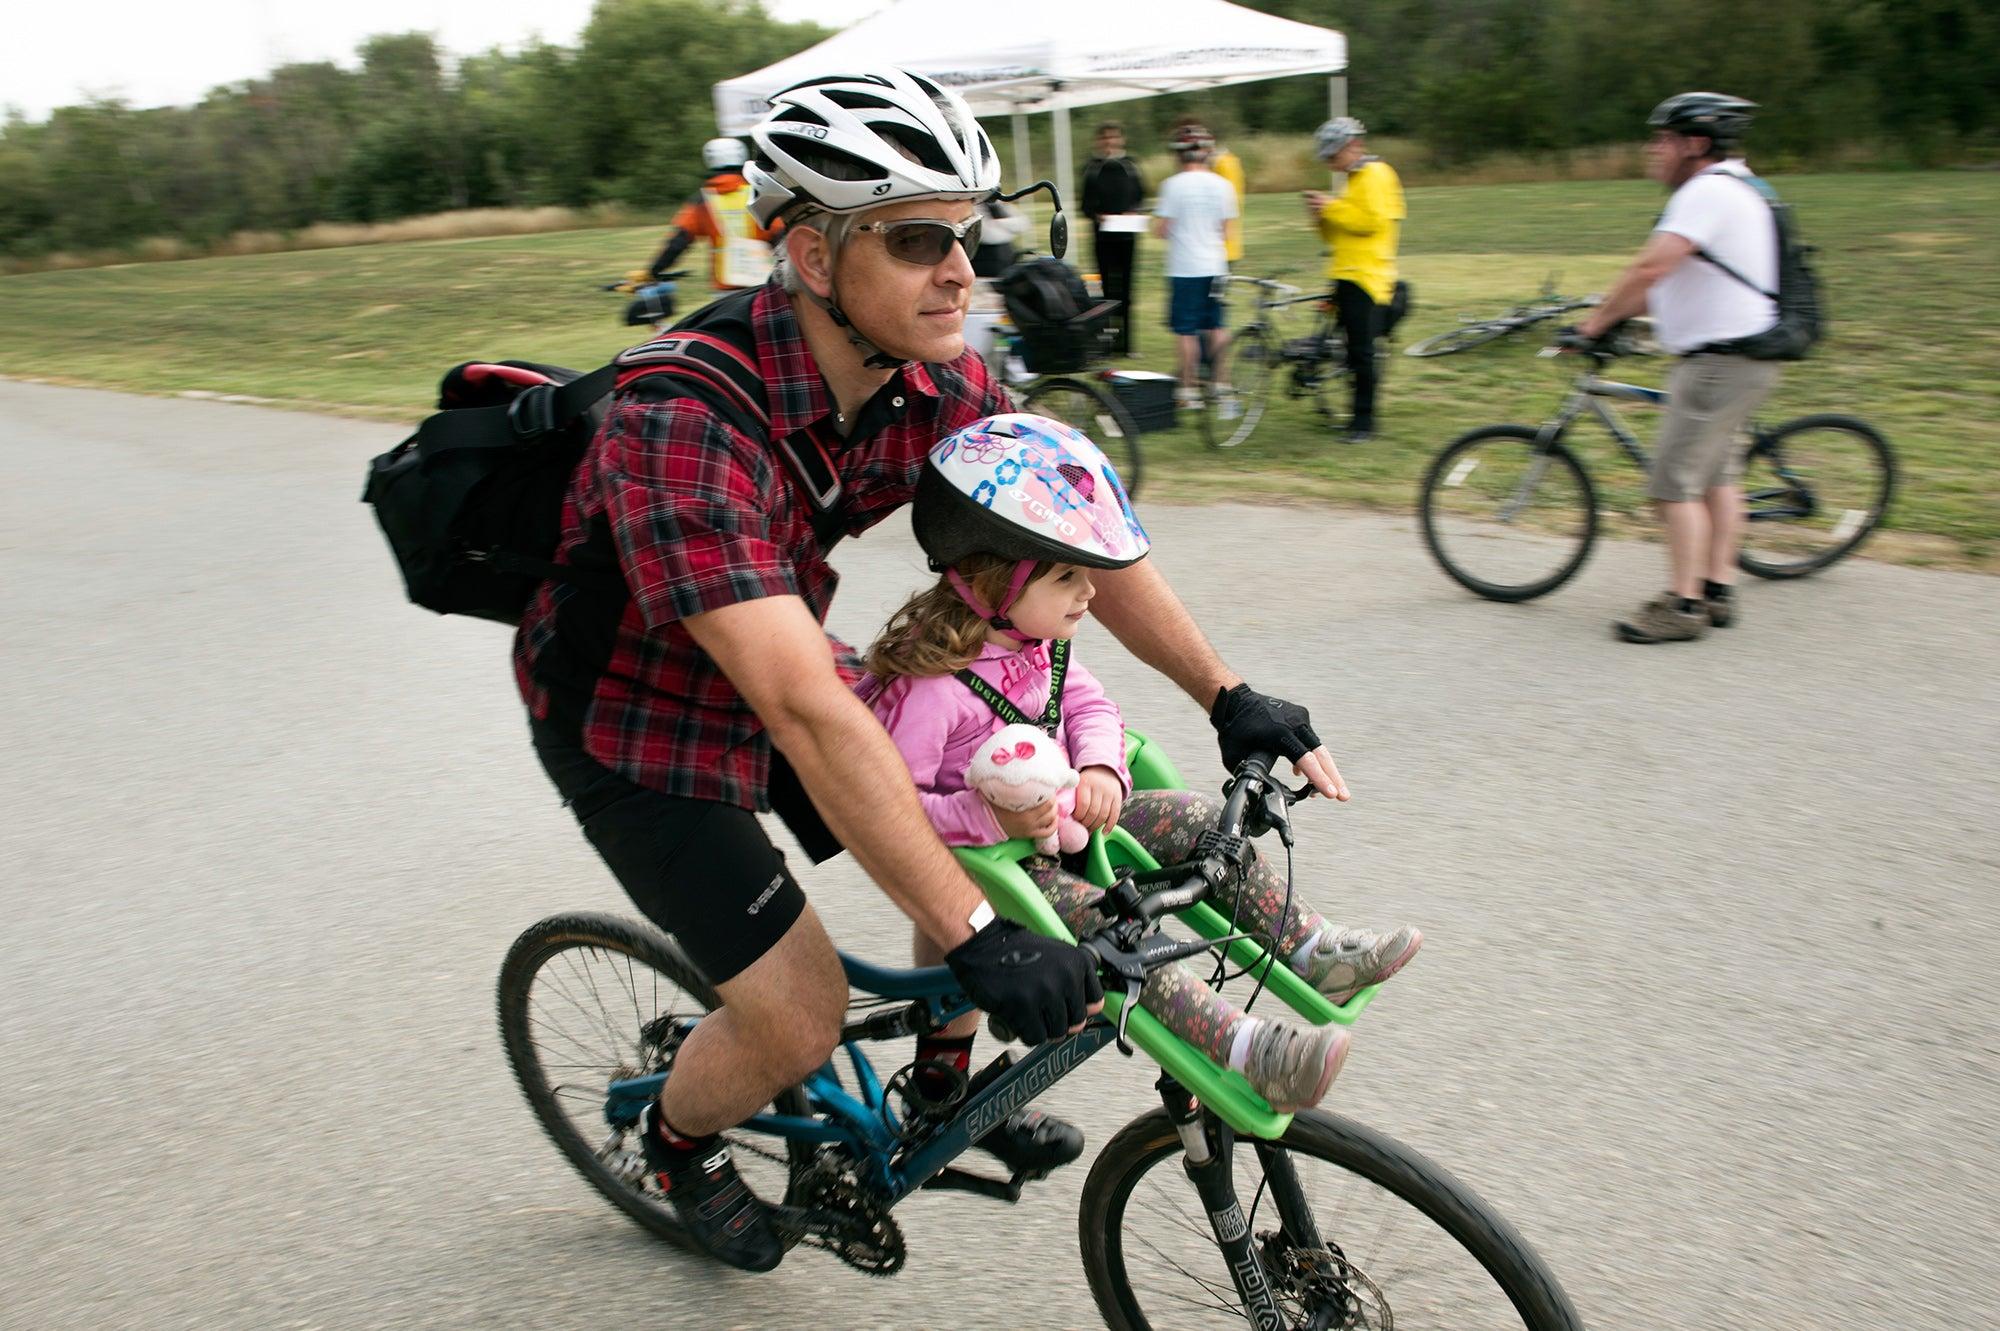 San Jose cyclist